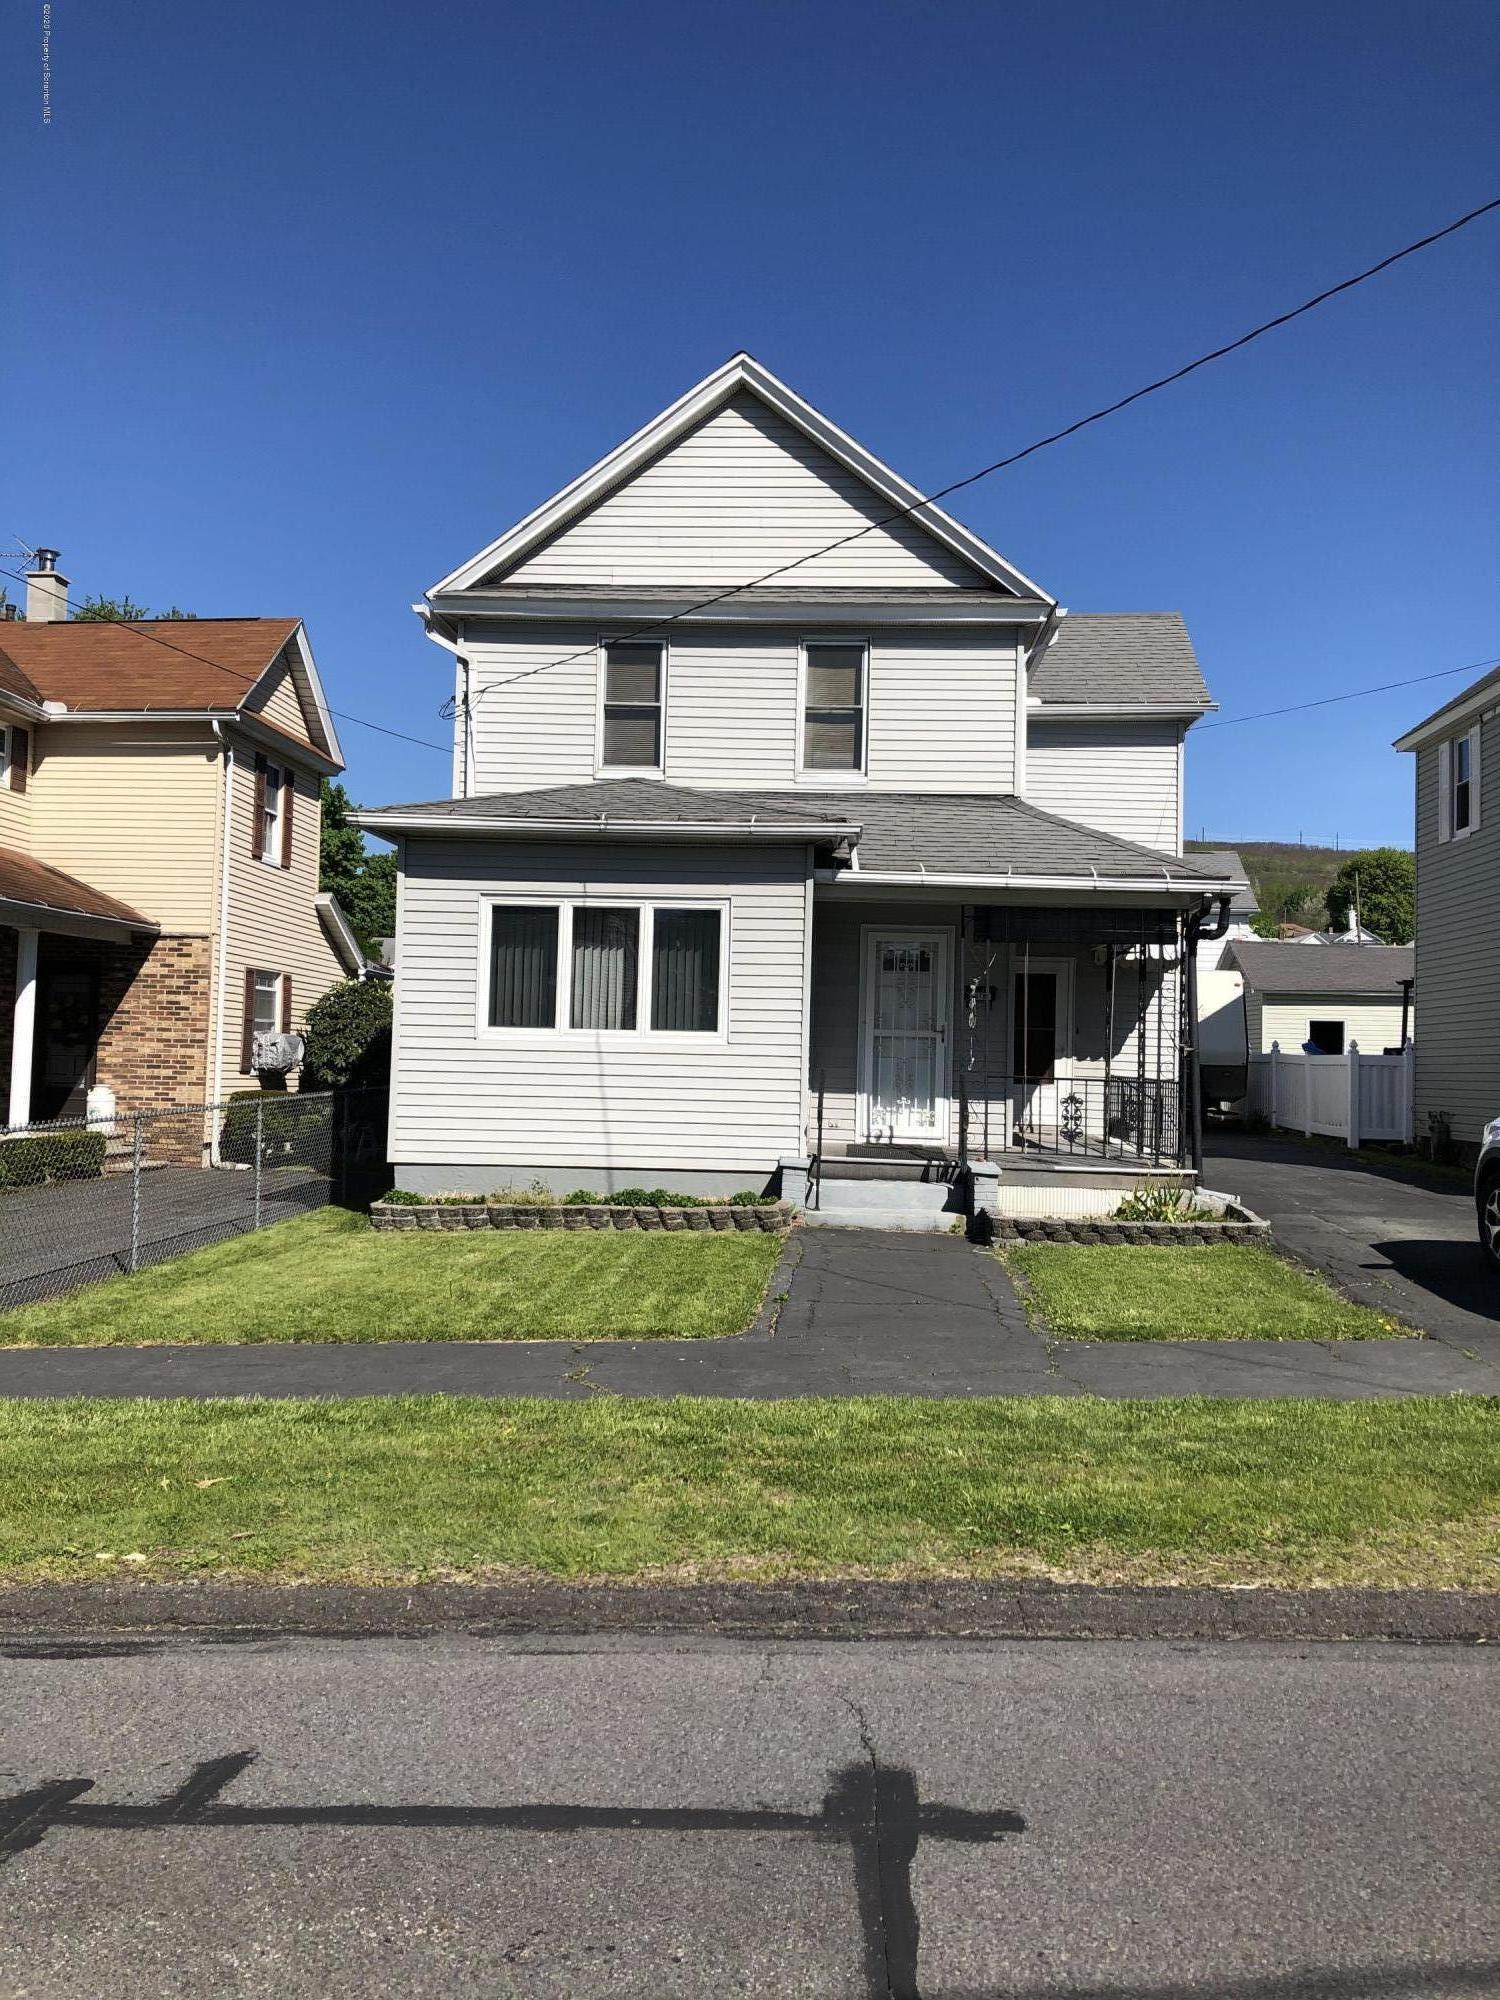 419 Academy St, Blakely, Pennsylvania 18452, 3 Bedrooms Bedrooms, 6 Rooms Rooms,1 BathroomBathrooms,Single Family,For Sale,Academy,20-1731